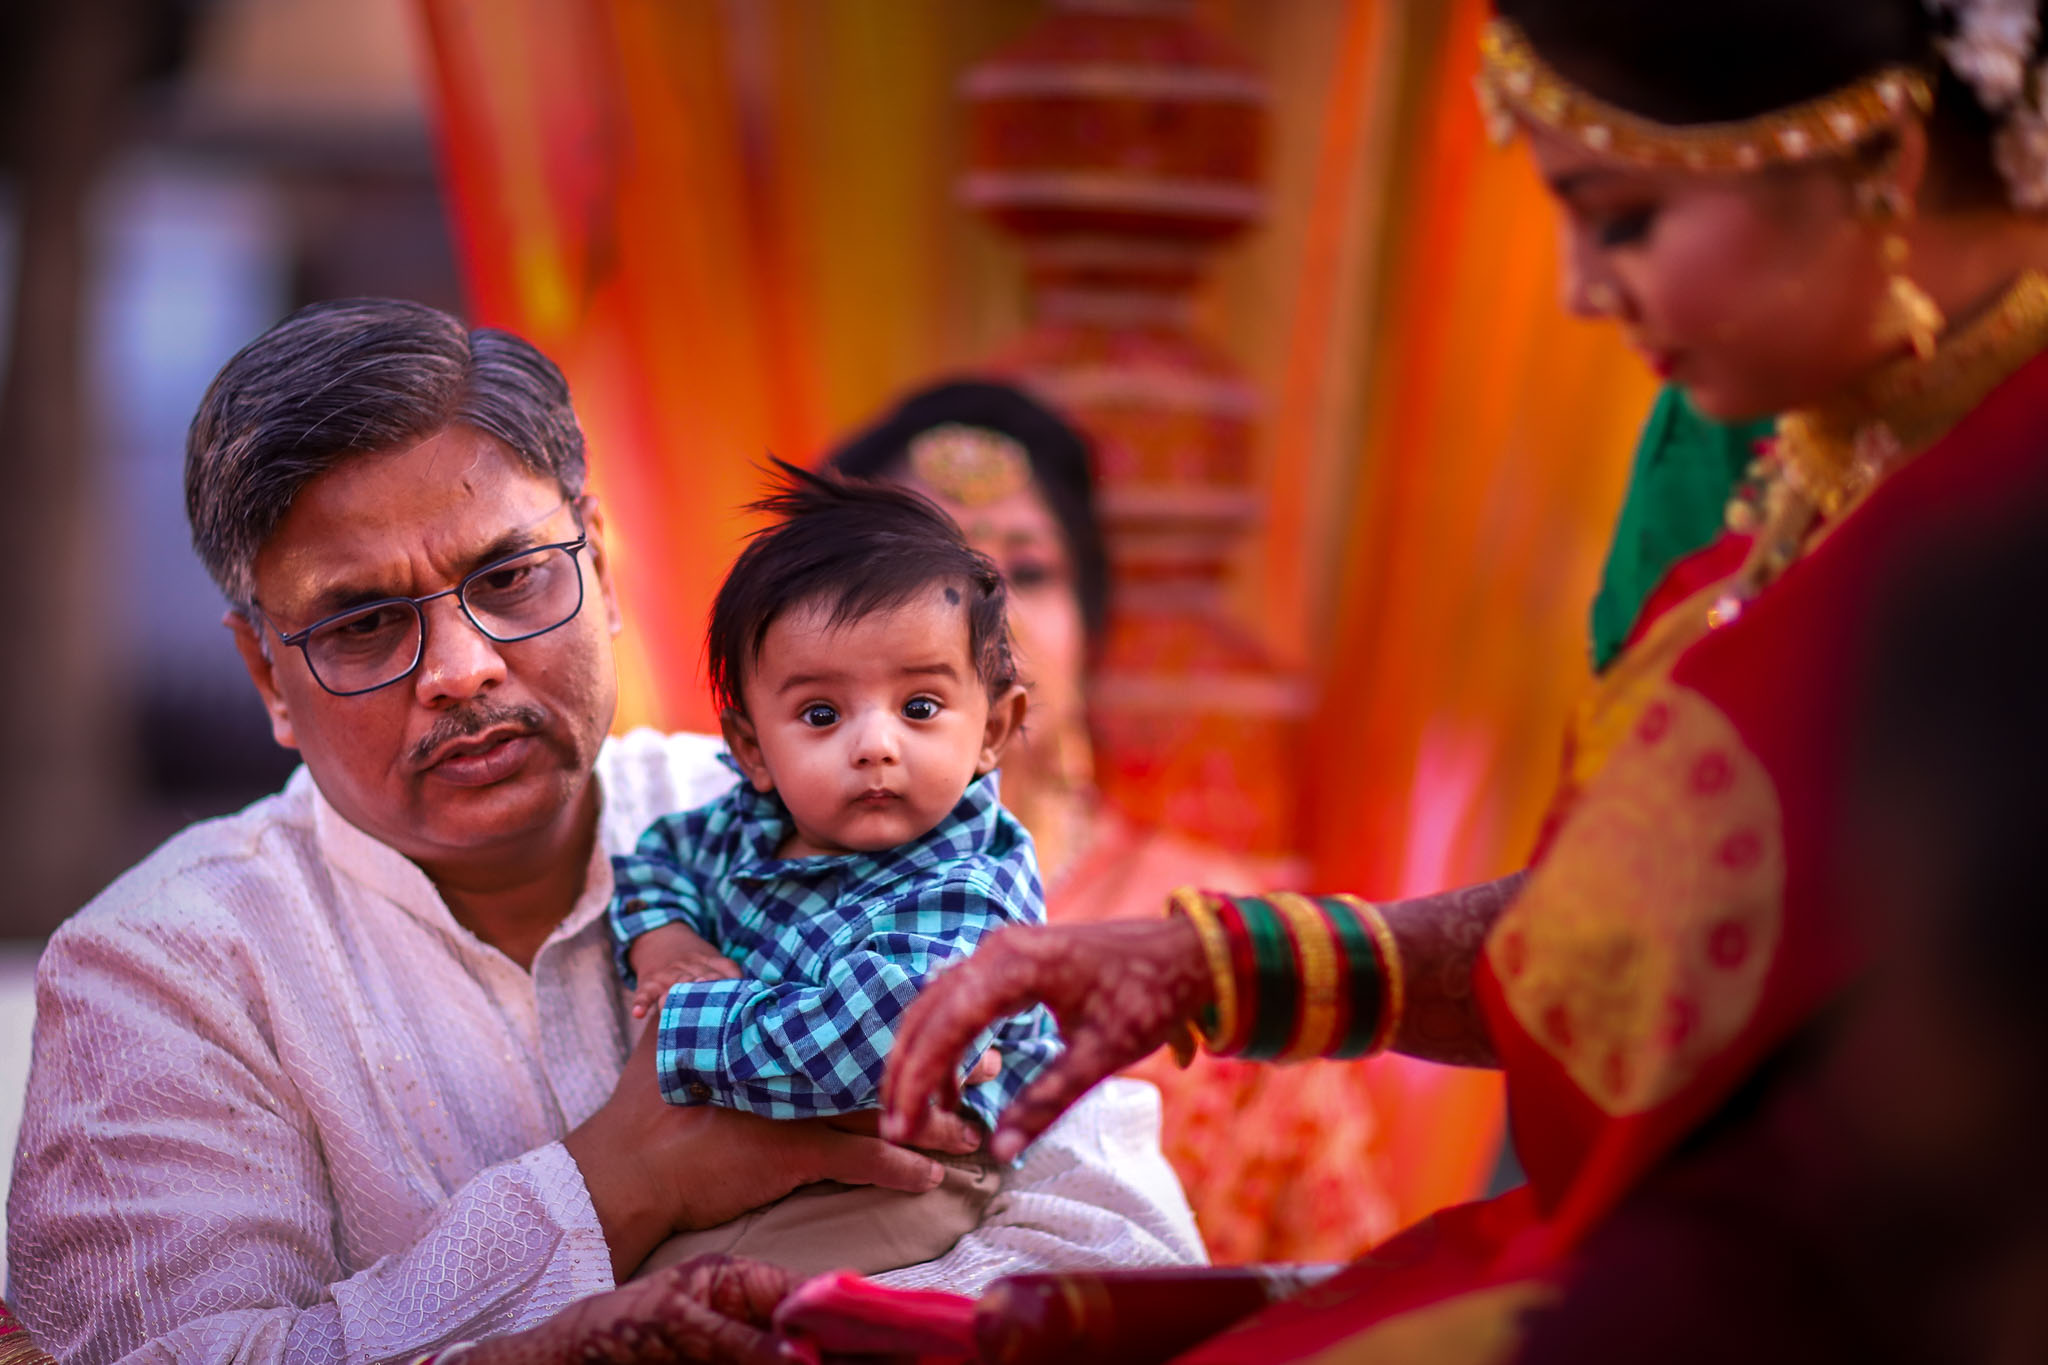 Mukti x Ojas Wedding Akshjay Sansare Photography Best wedding photographer in mumbai India Candid Cinematic Films videos-45.jpg